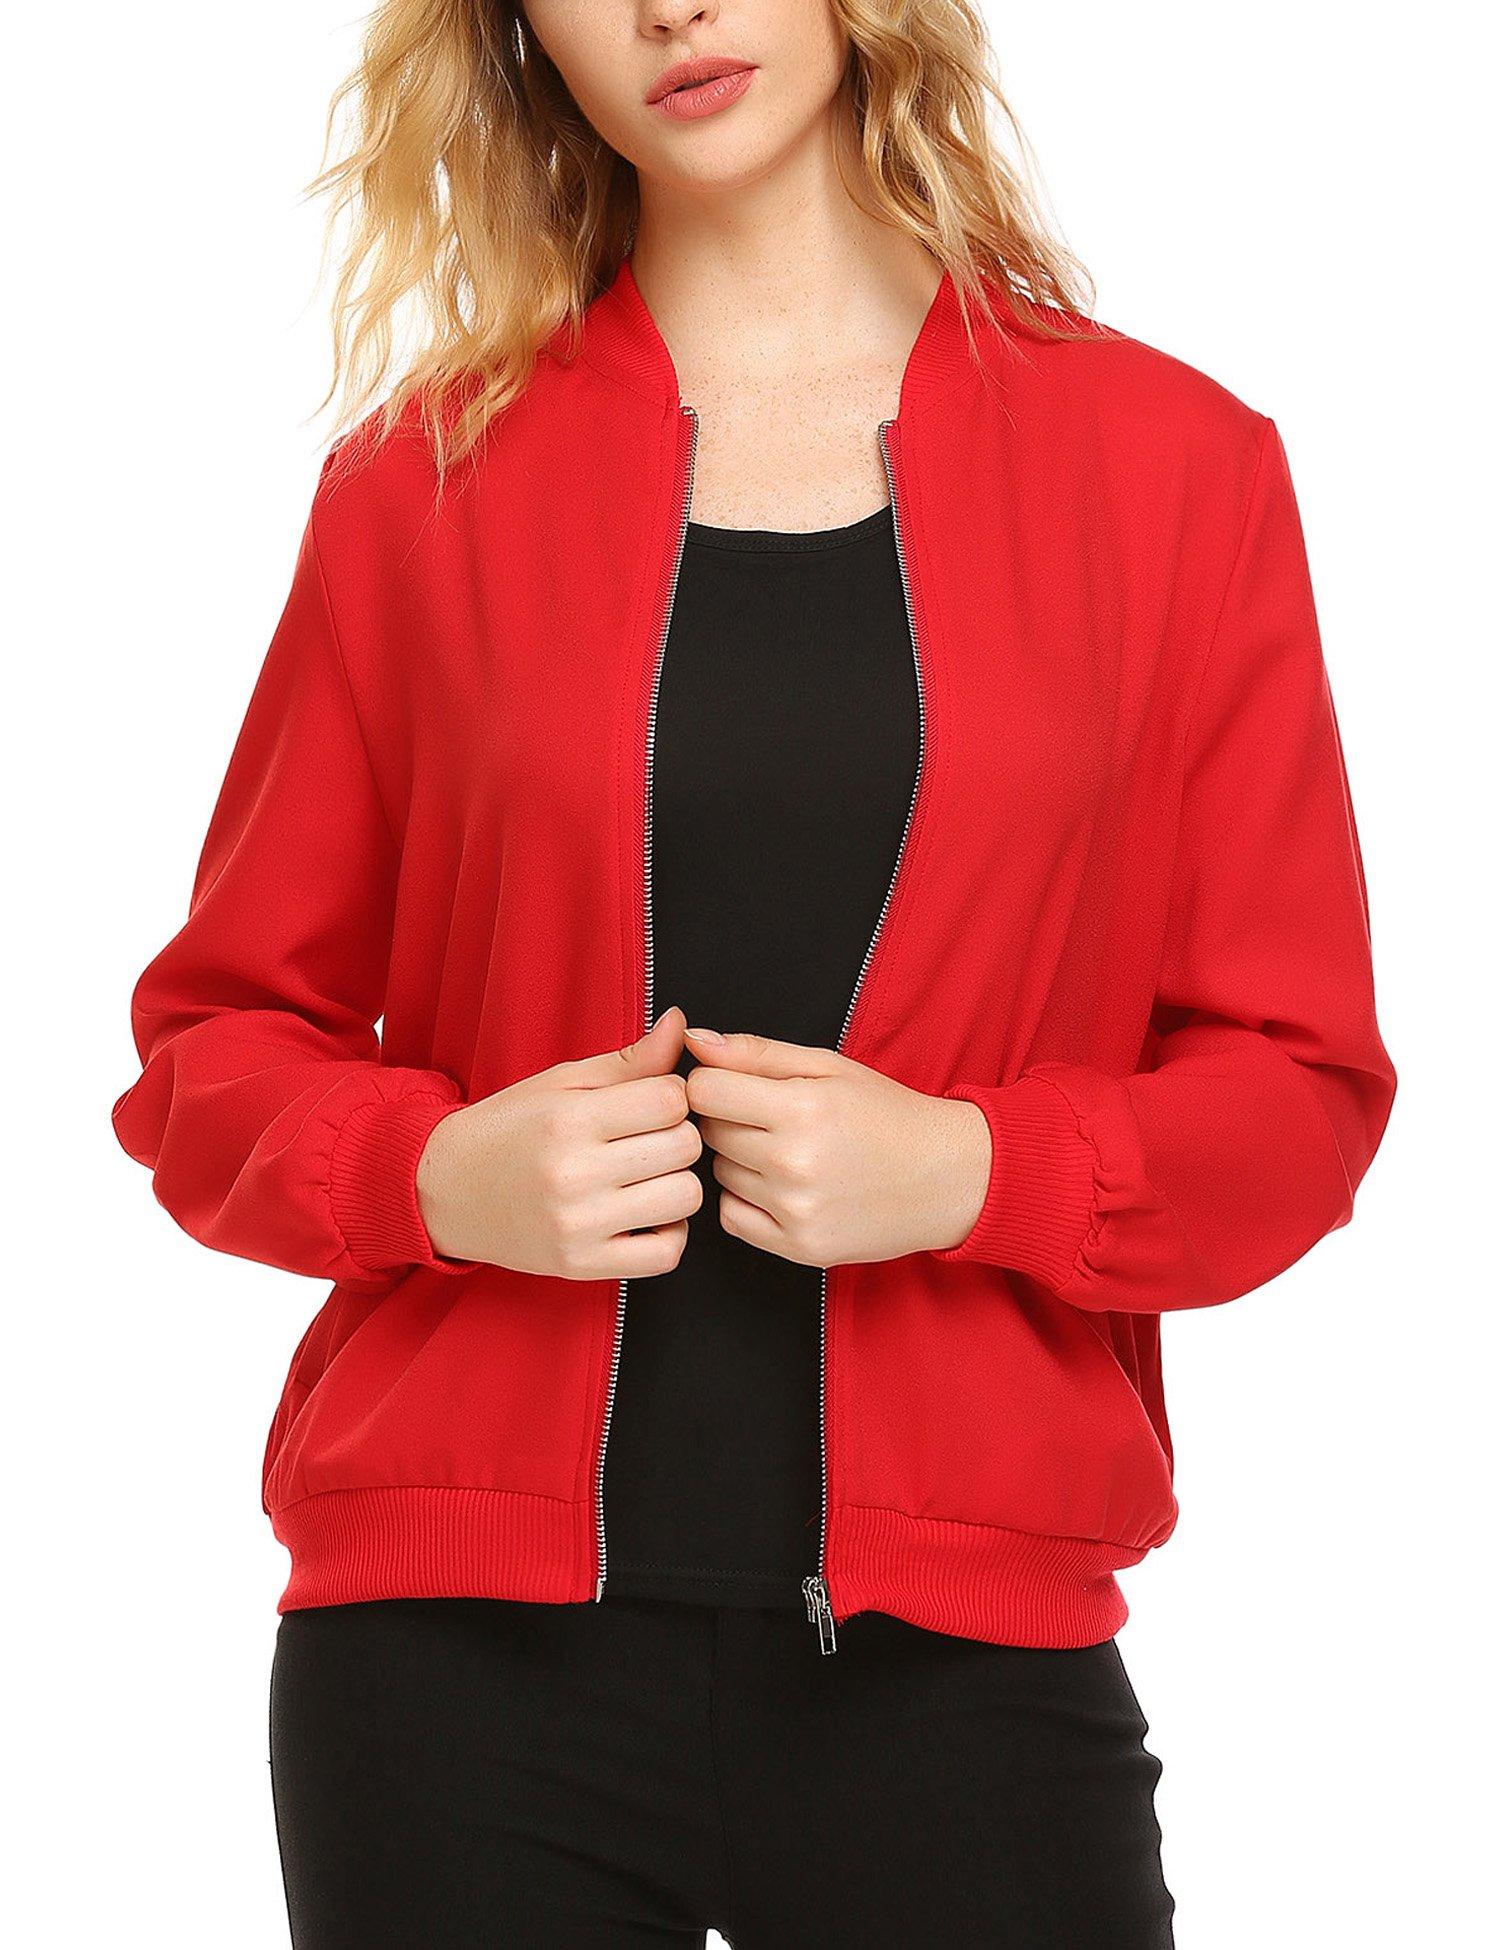 Zeagoo Women's Sporty Zip up Long Sleeve Coat Lightweight Bomber Jacket (Red, X-Large)